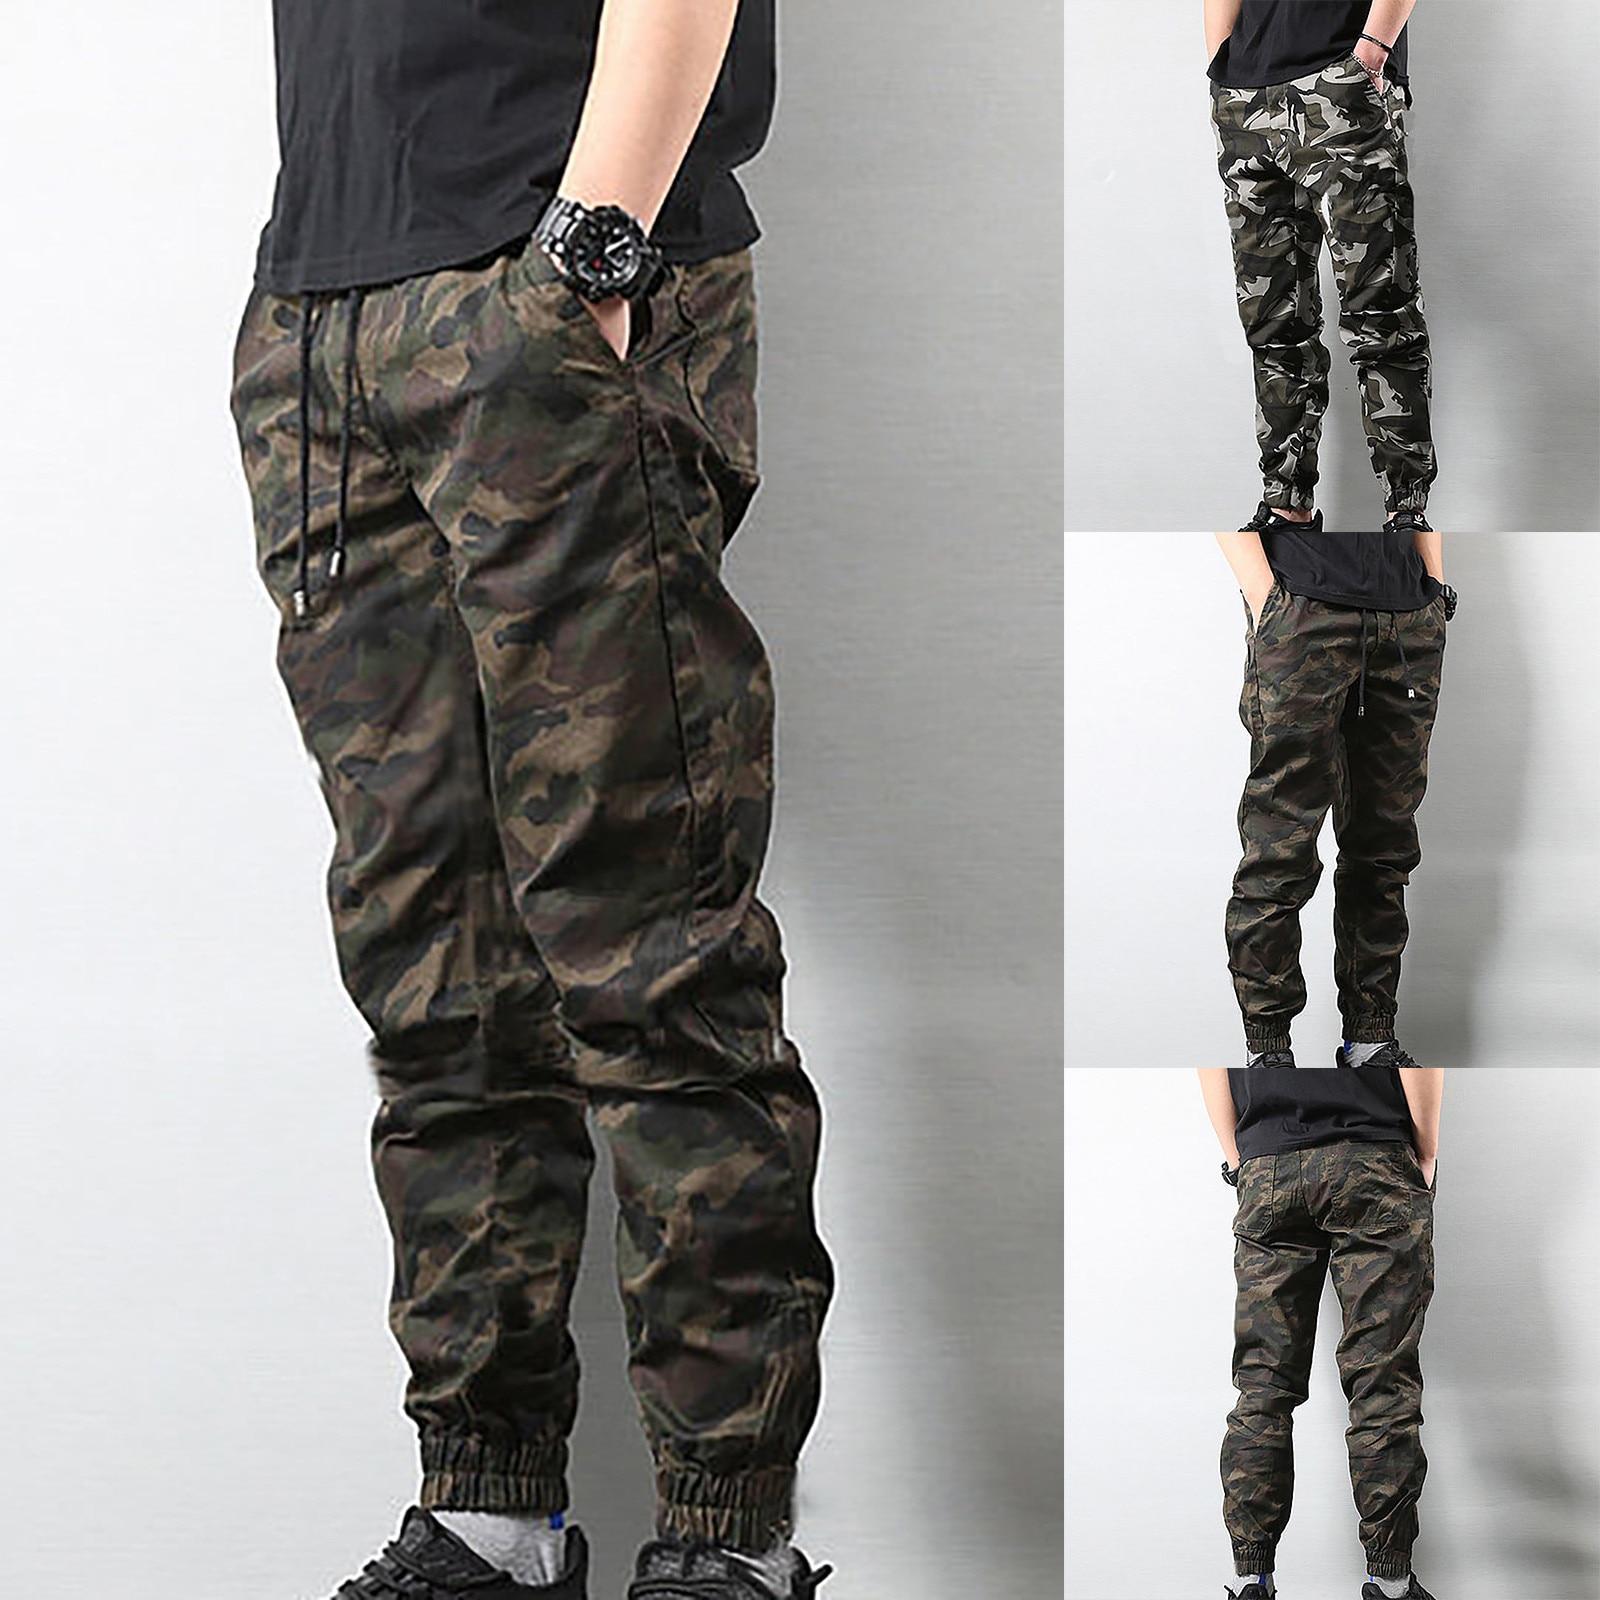 2021 Men's Fashion Casual Plus Size Loose Printing Sports Long Sweatpants Pants Male Sports Running Gym Sweatpants штаны мужские